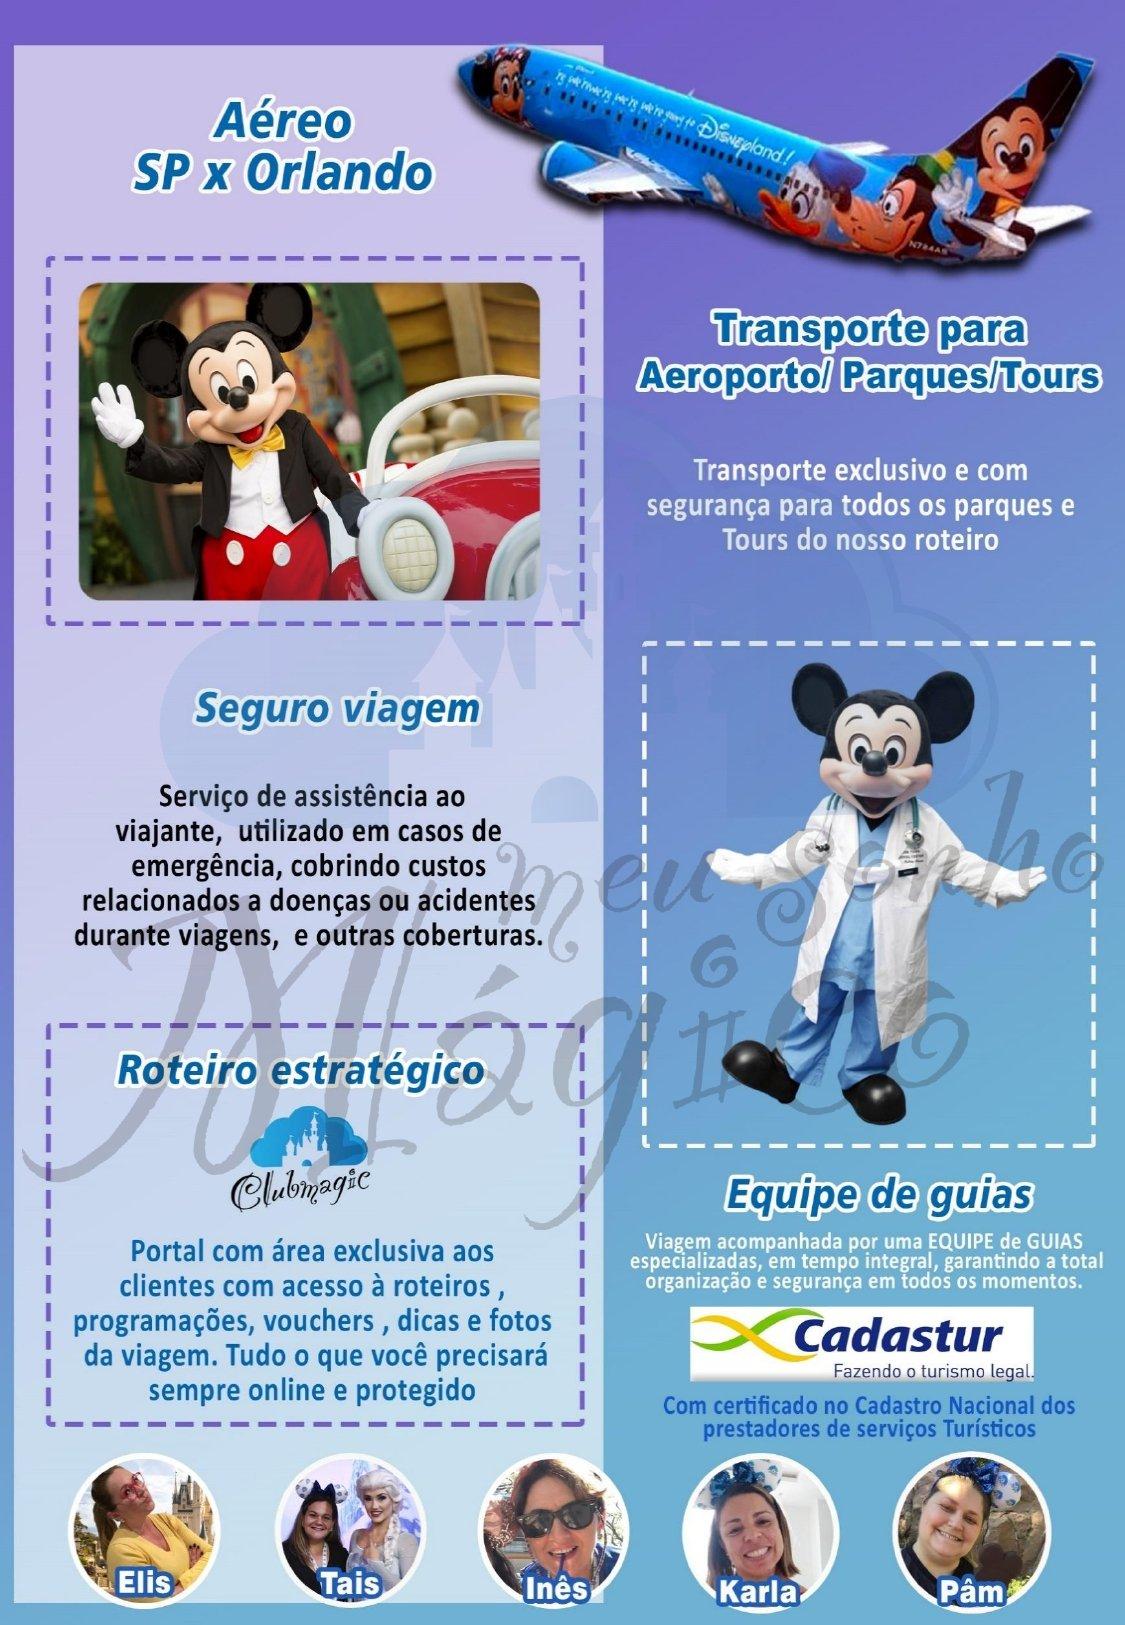 Grupo Family Natal - Disney Novembro 2022 7